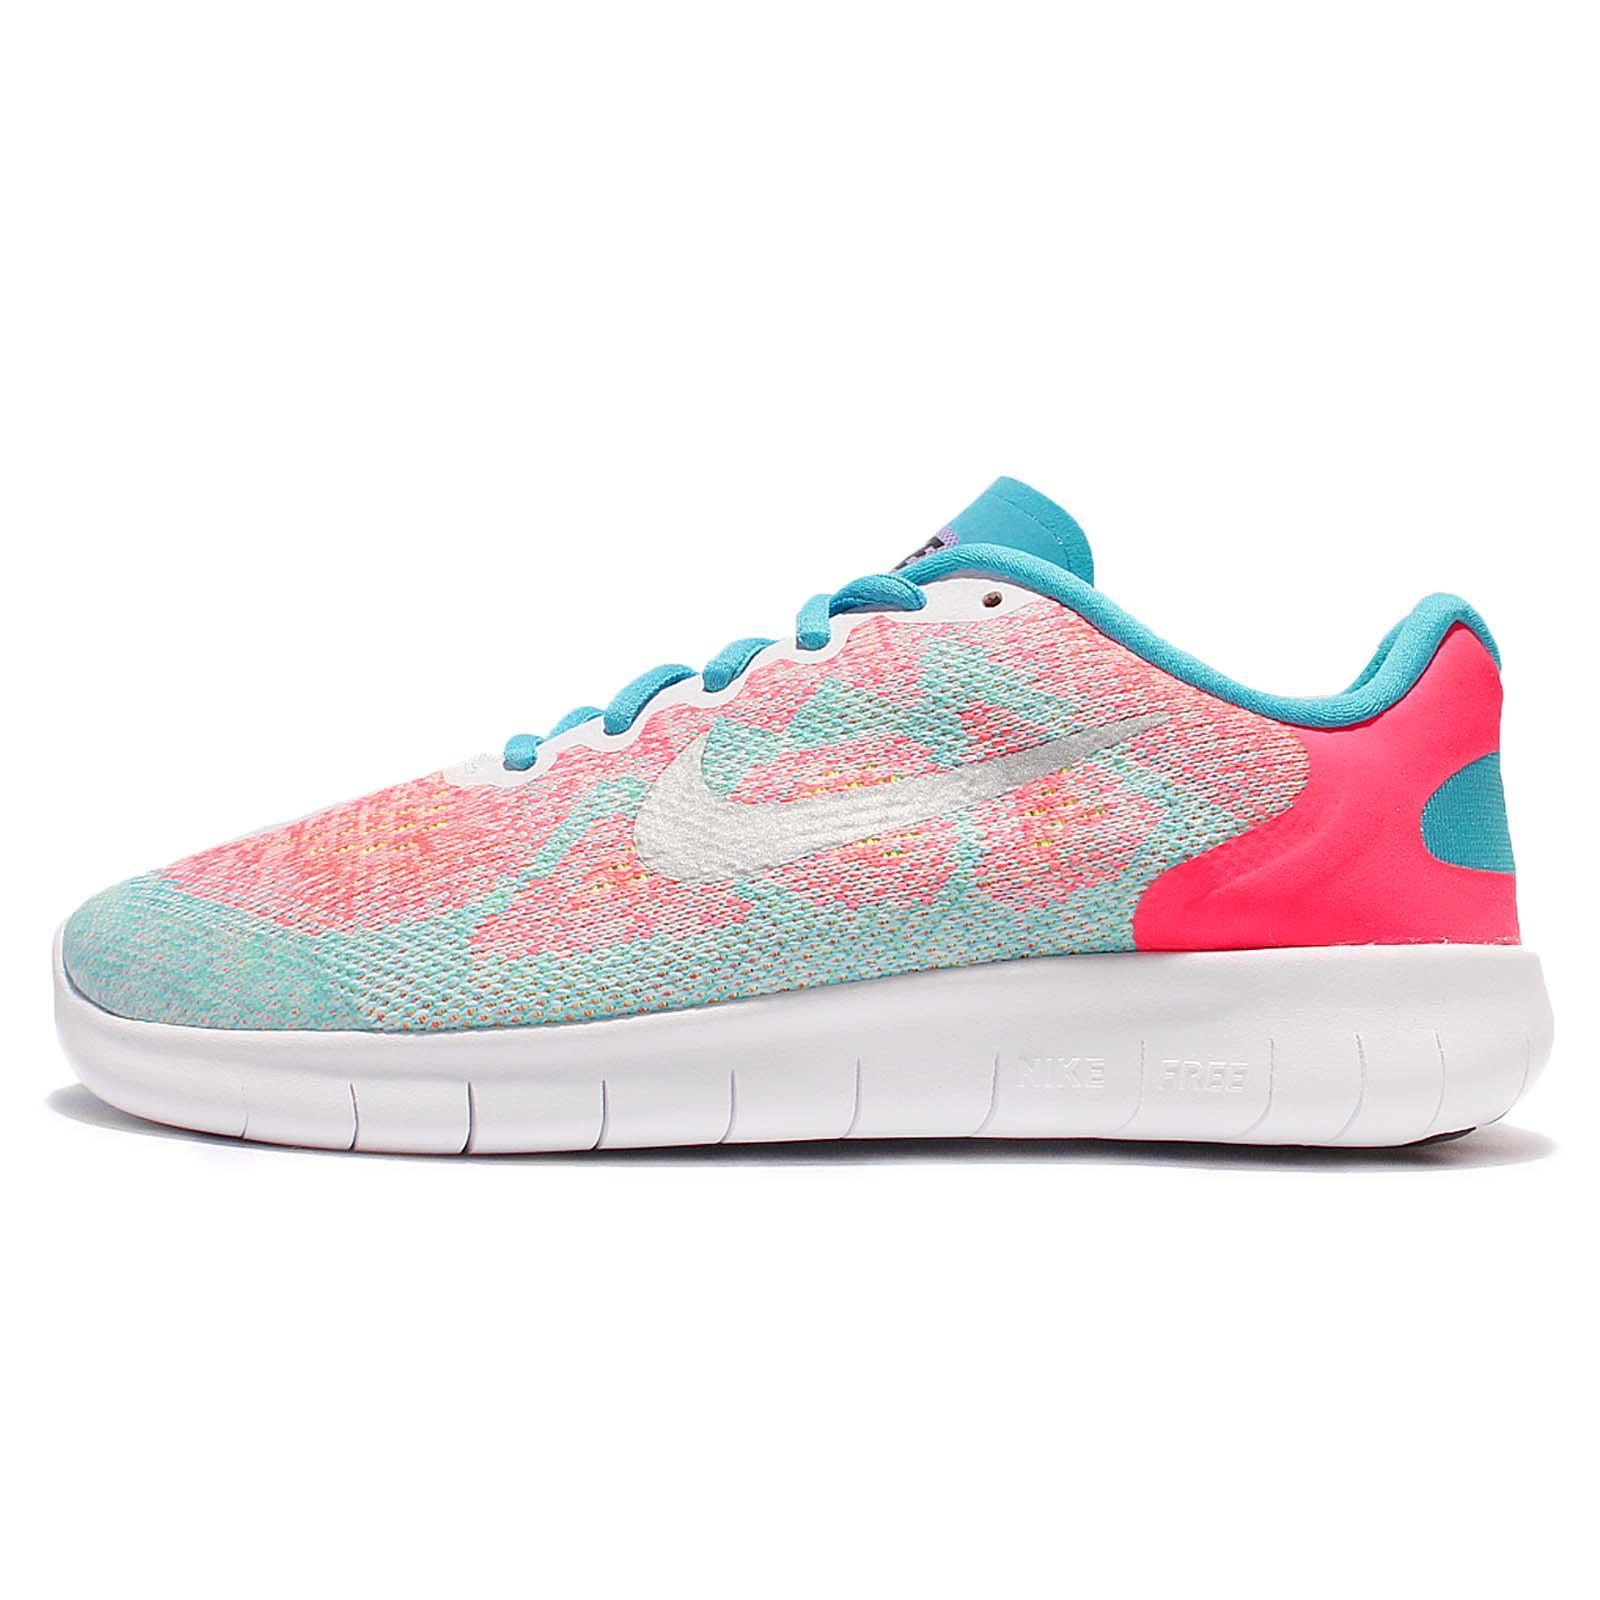 34ce9f2260f nike free rn 2017 essential id women s running shoe nz